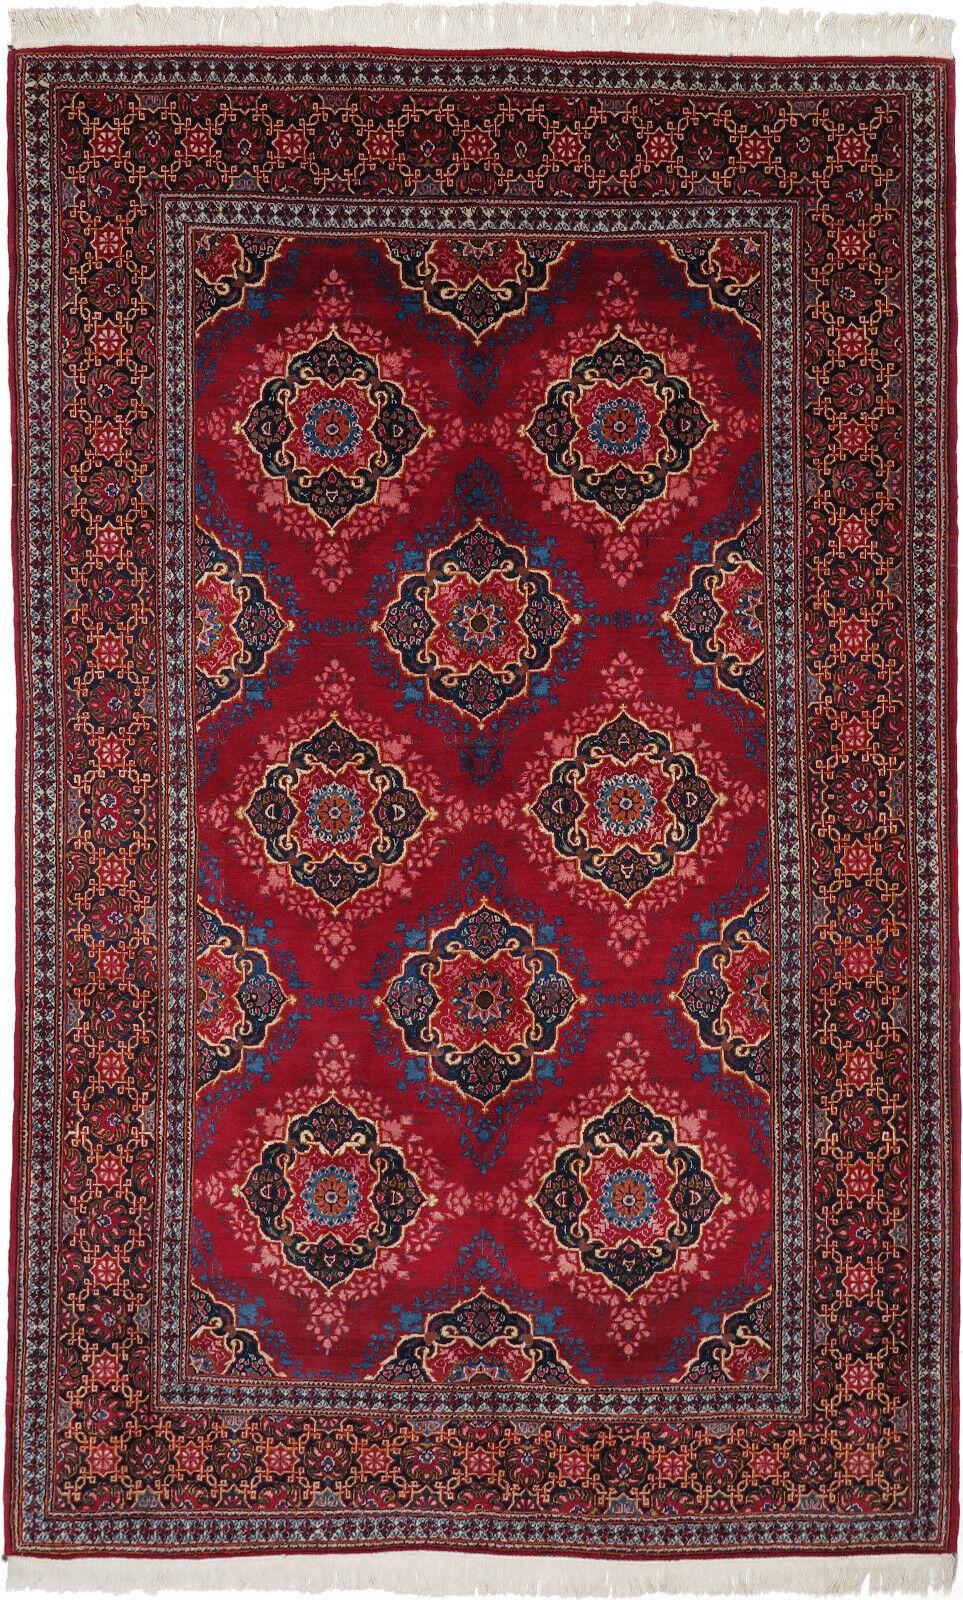 Kashan Teppich Orientteppich Rug Carpet Carpet Carpet Tapis Tapijt Tappeto Alfombra Elegance 697791